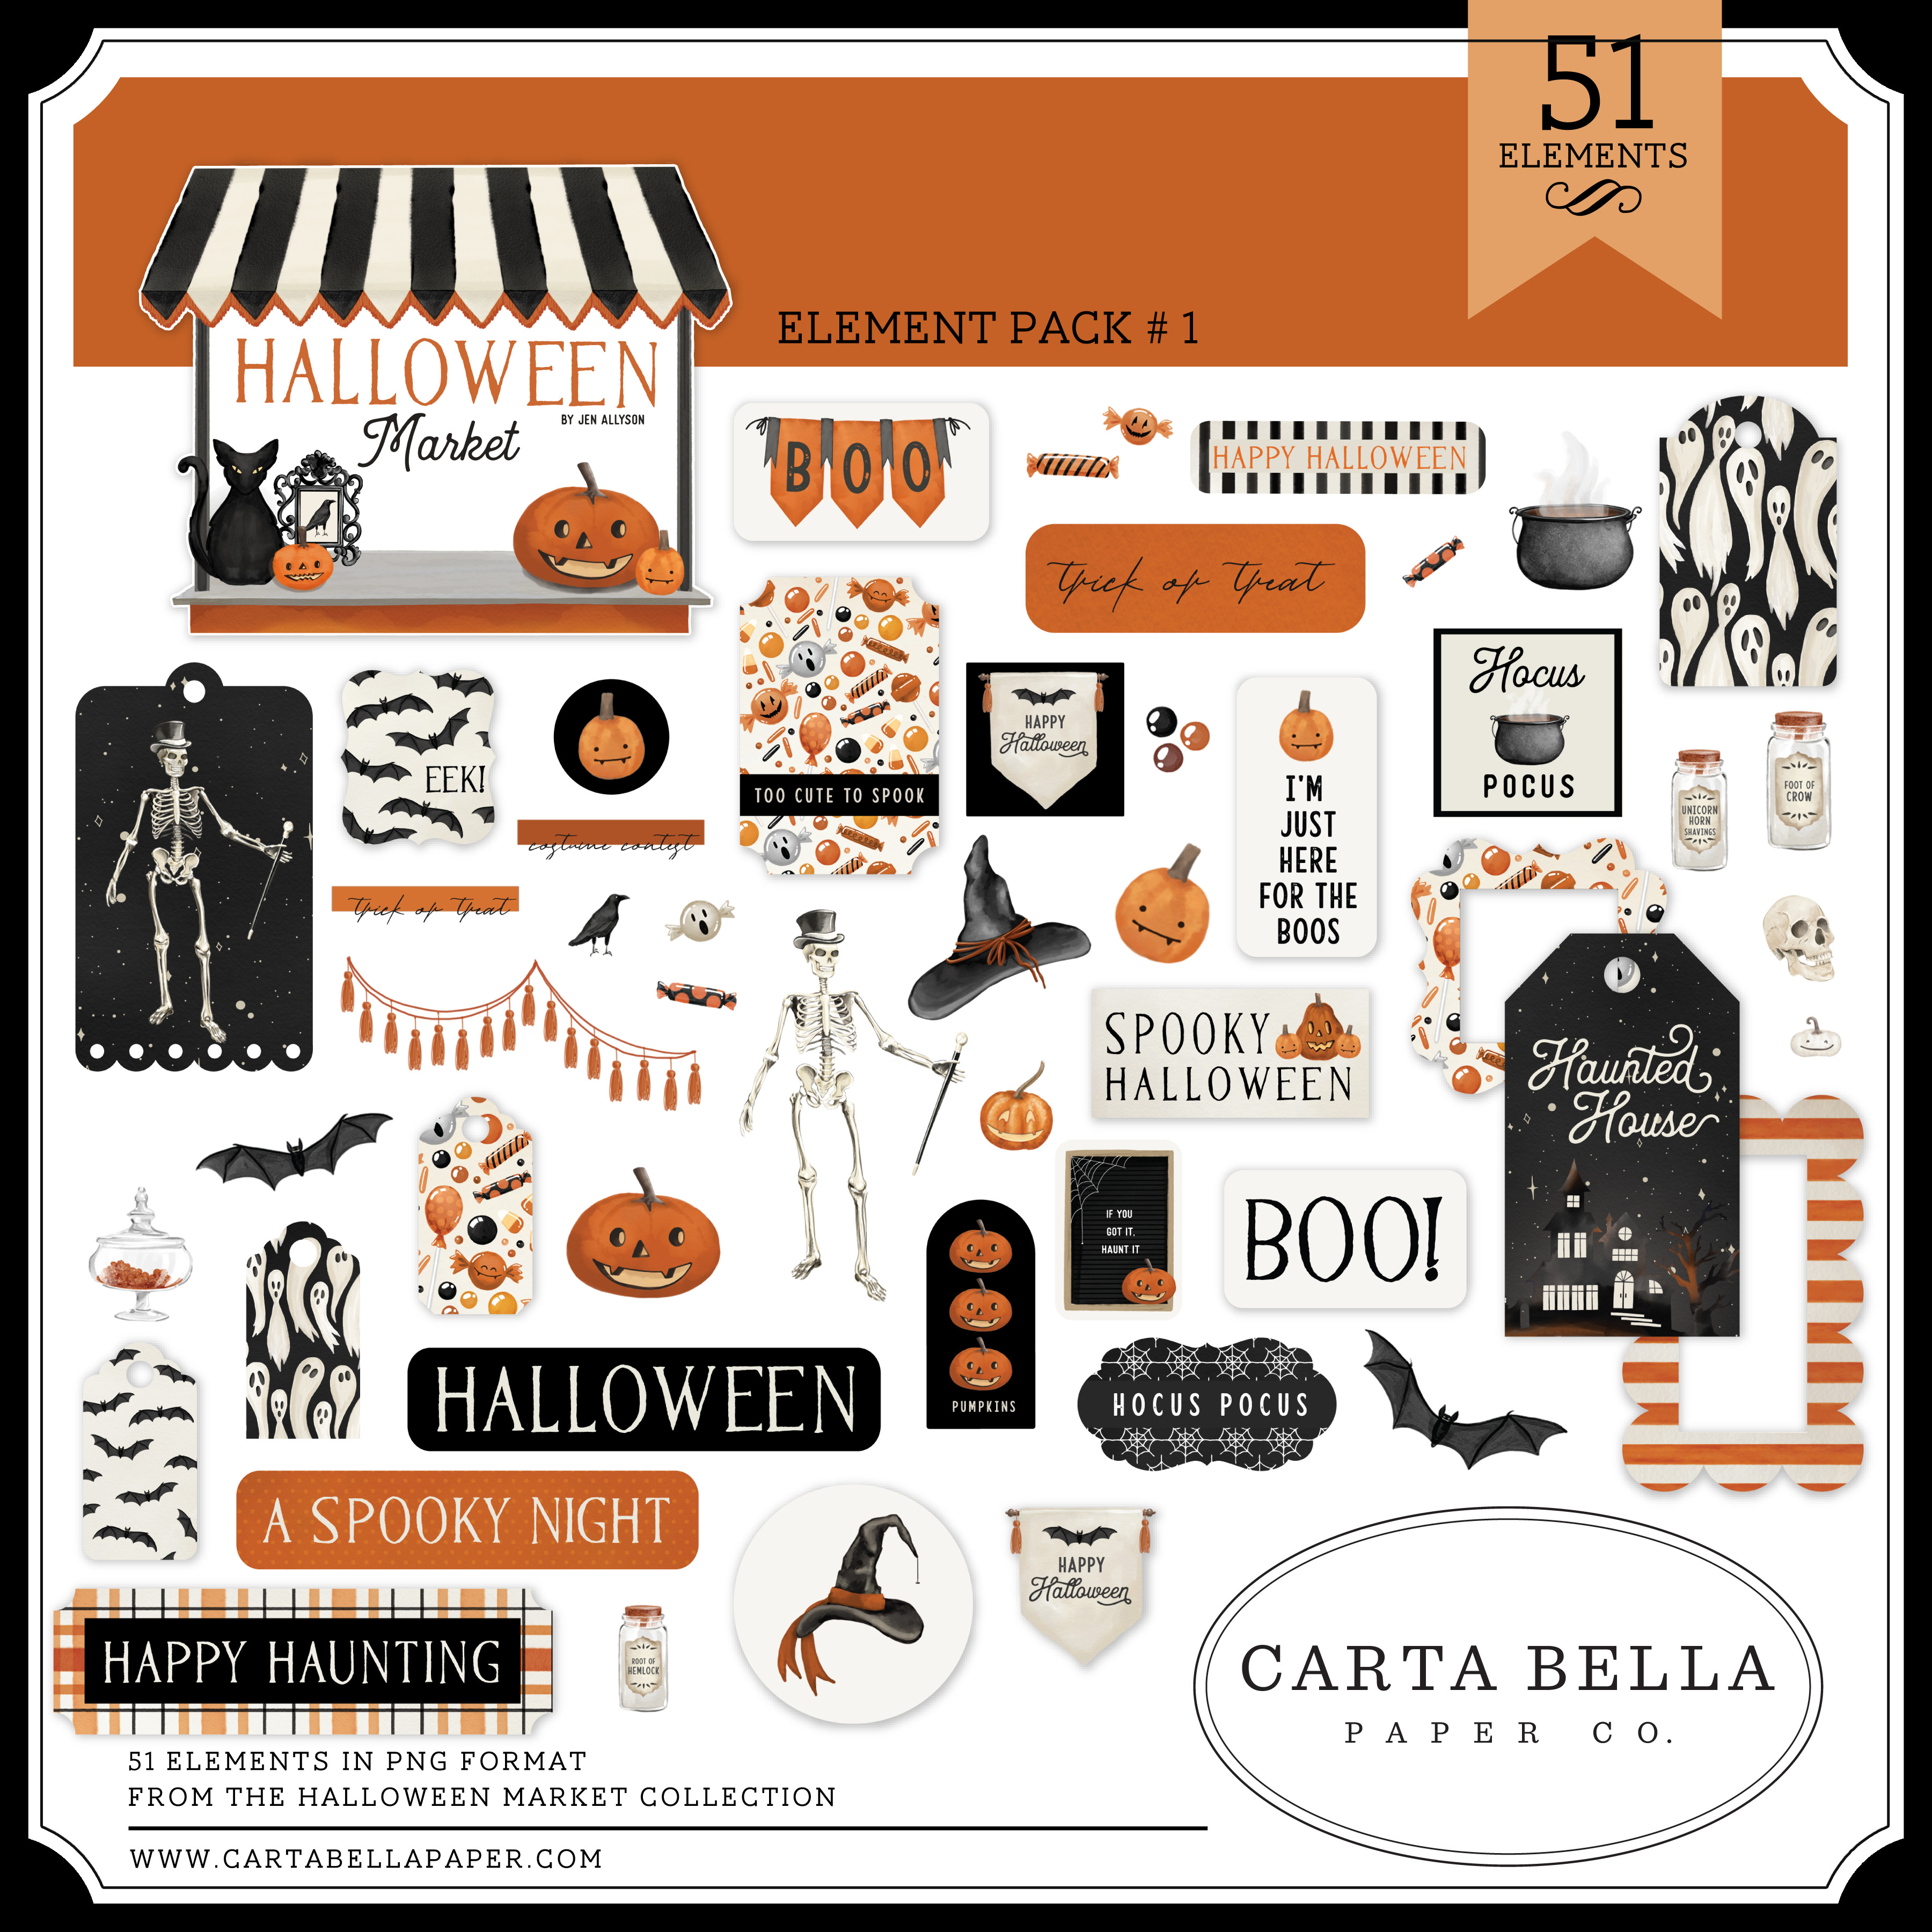 Halloween Market Element Pack #1